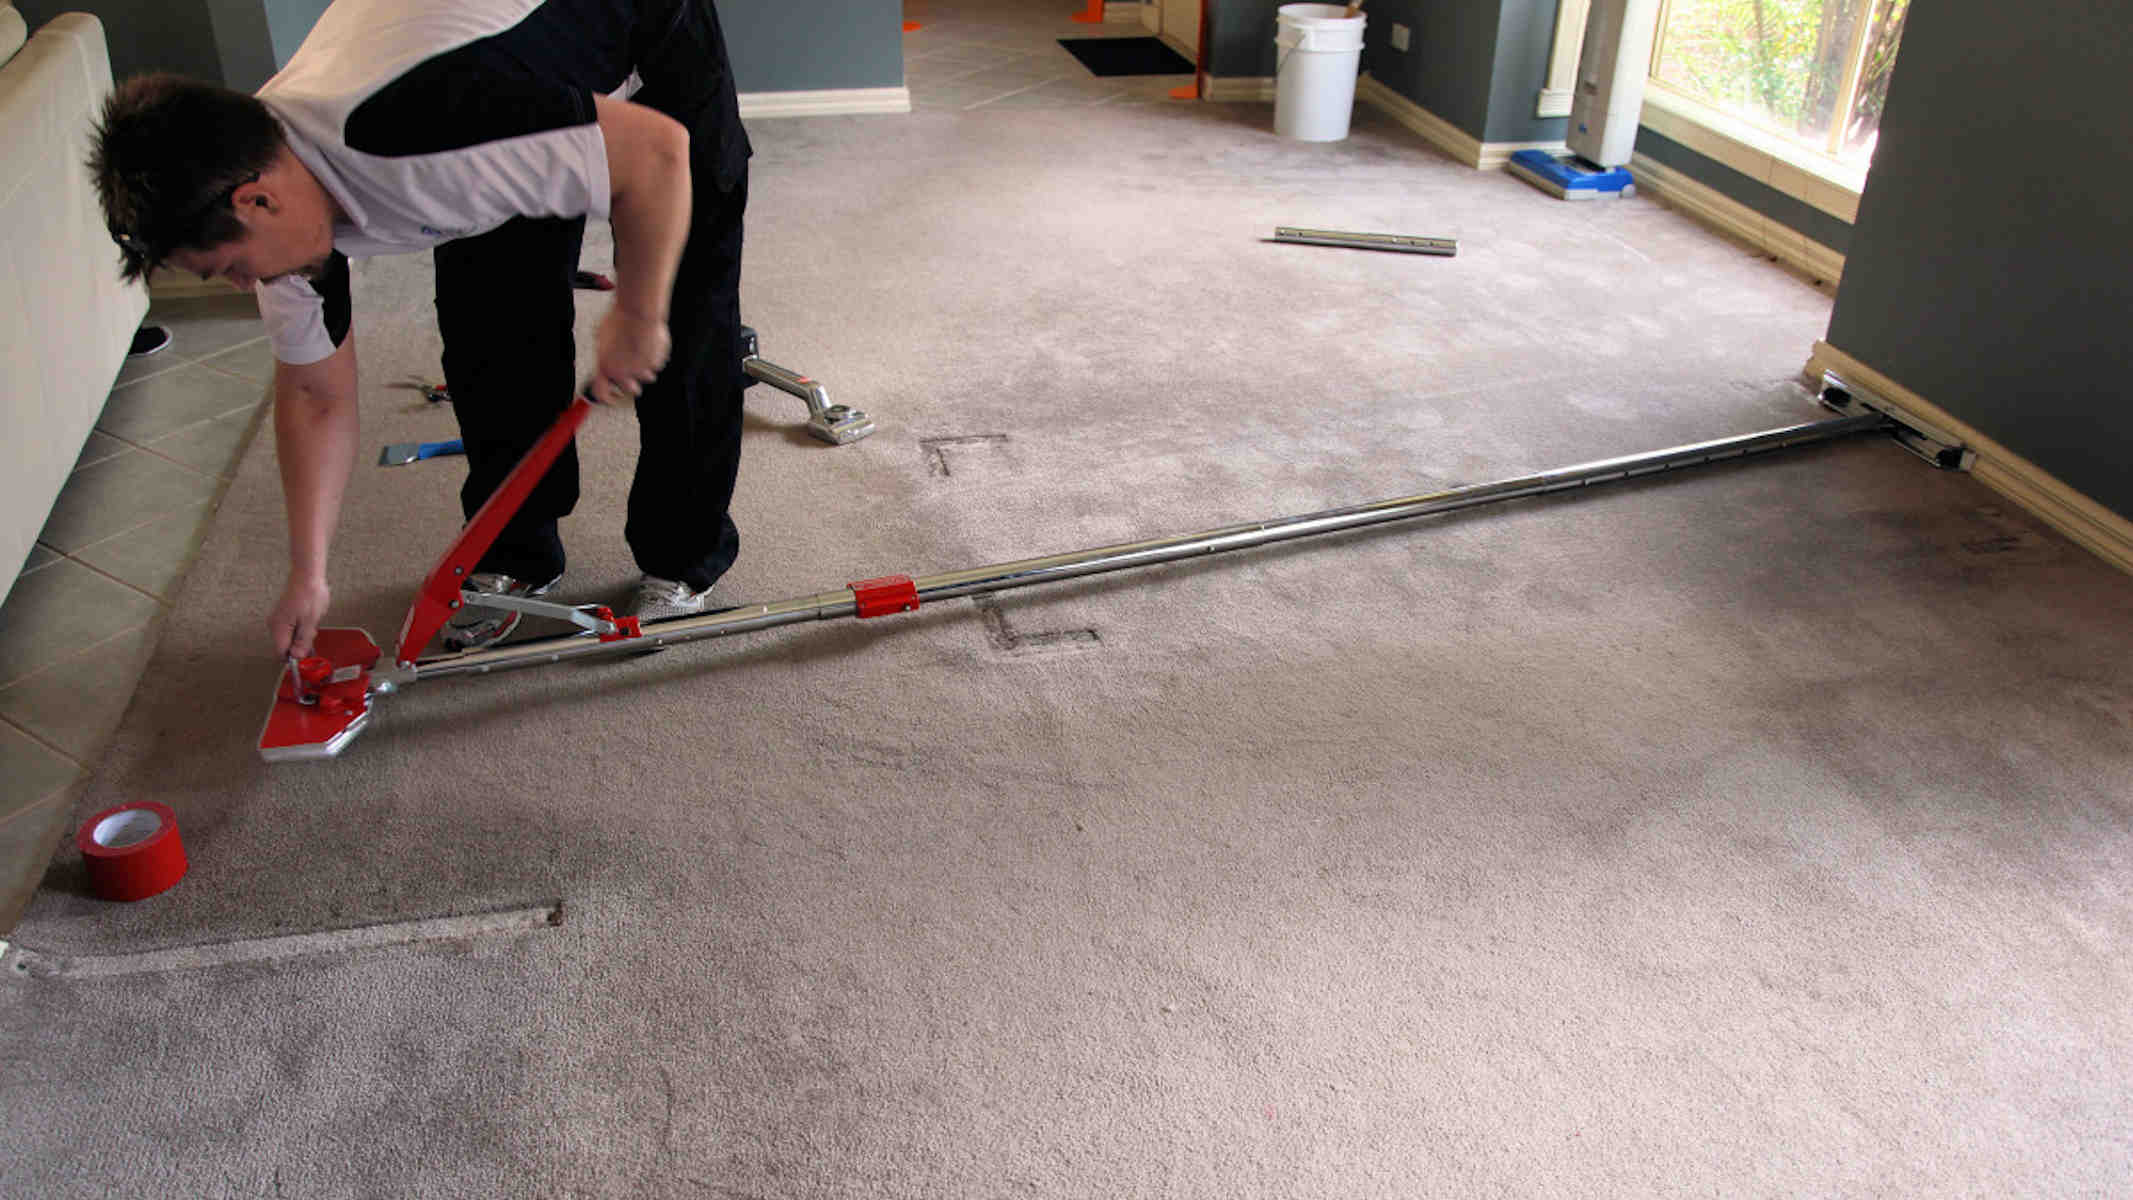 Carpet Repair - Carpet restretching